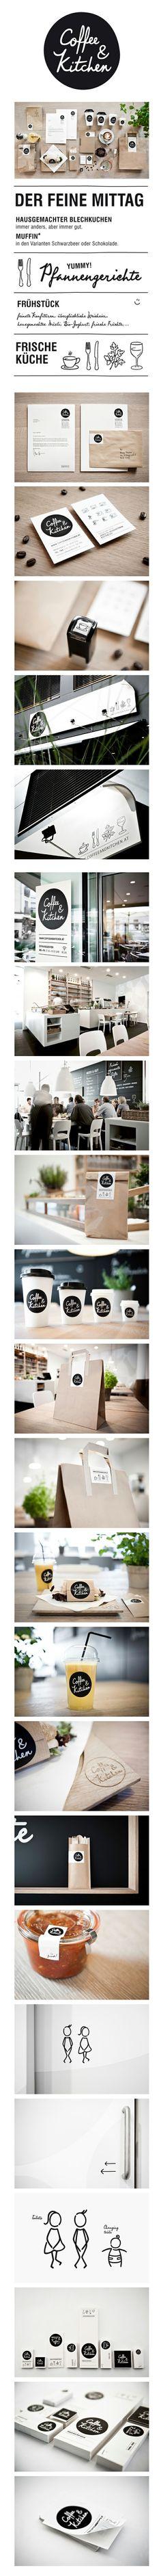 Coffee & Kitchen Identity Project moodley brand identity www.moodley.at